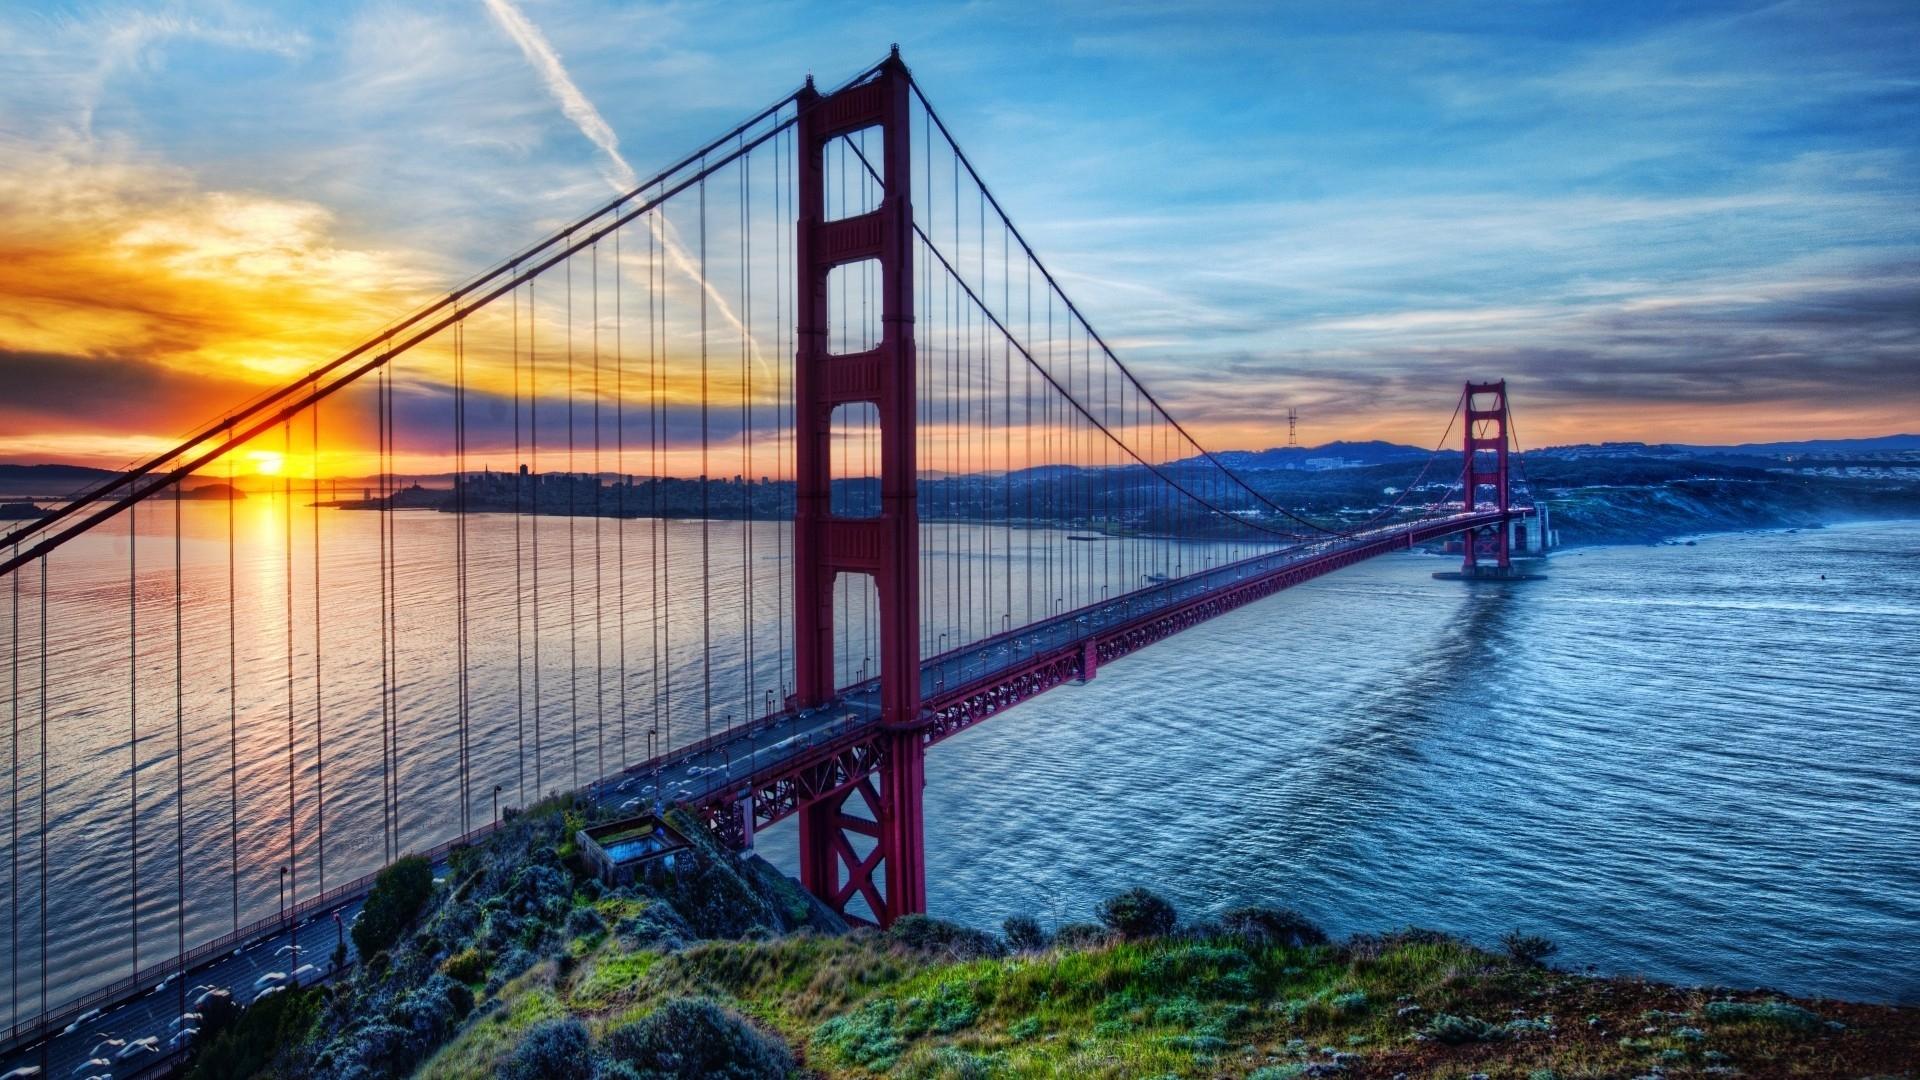 Amazing Wallpaper Night Golden Gate Bridge - golden_gate_bridge_san_francisco_strait_66225_1920x1080  Pictures-55249.jpg